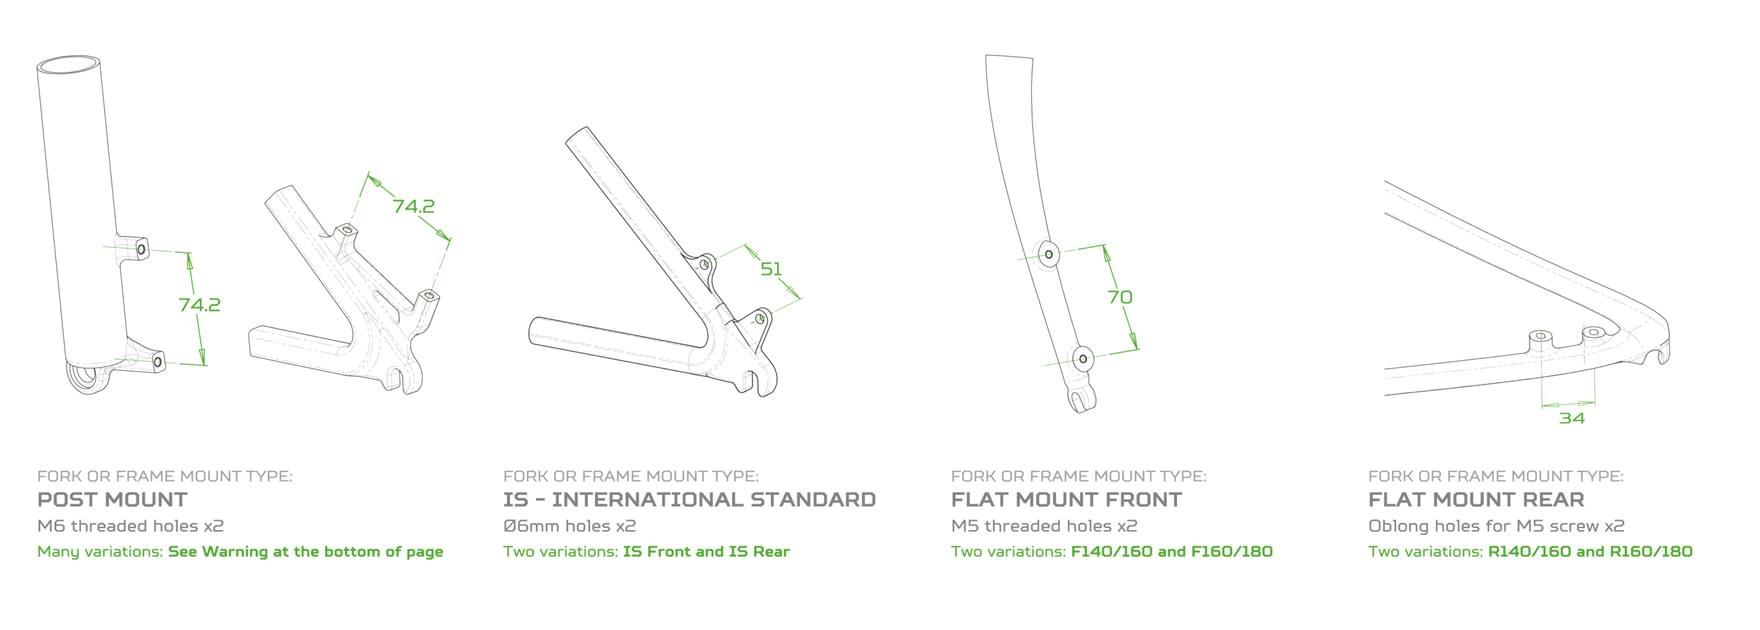 Hope Brake Mount Type Identification Guide 01